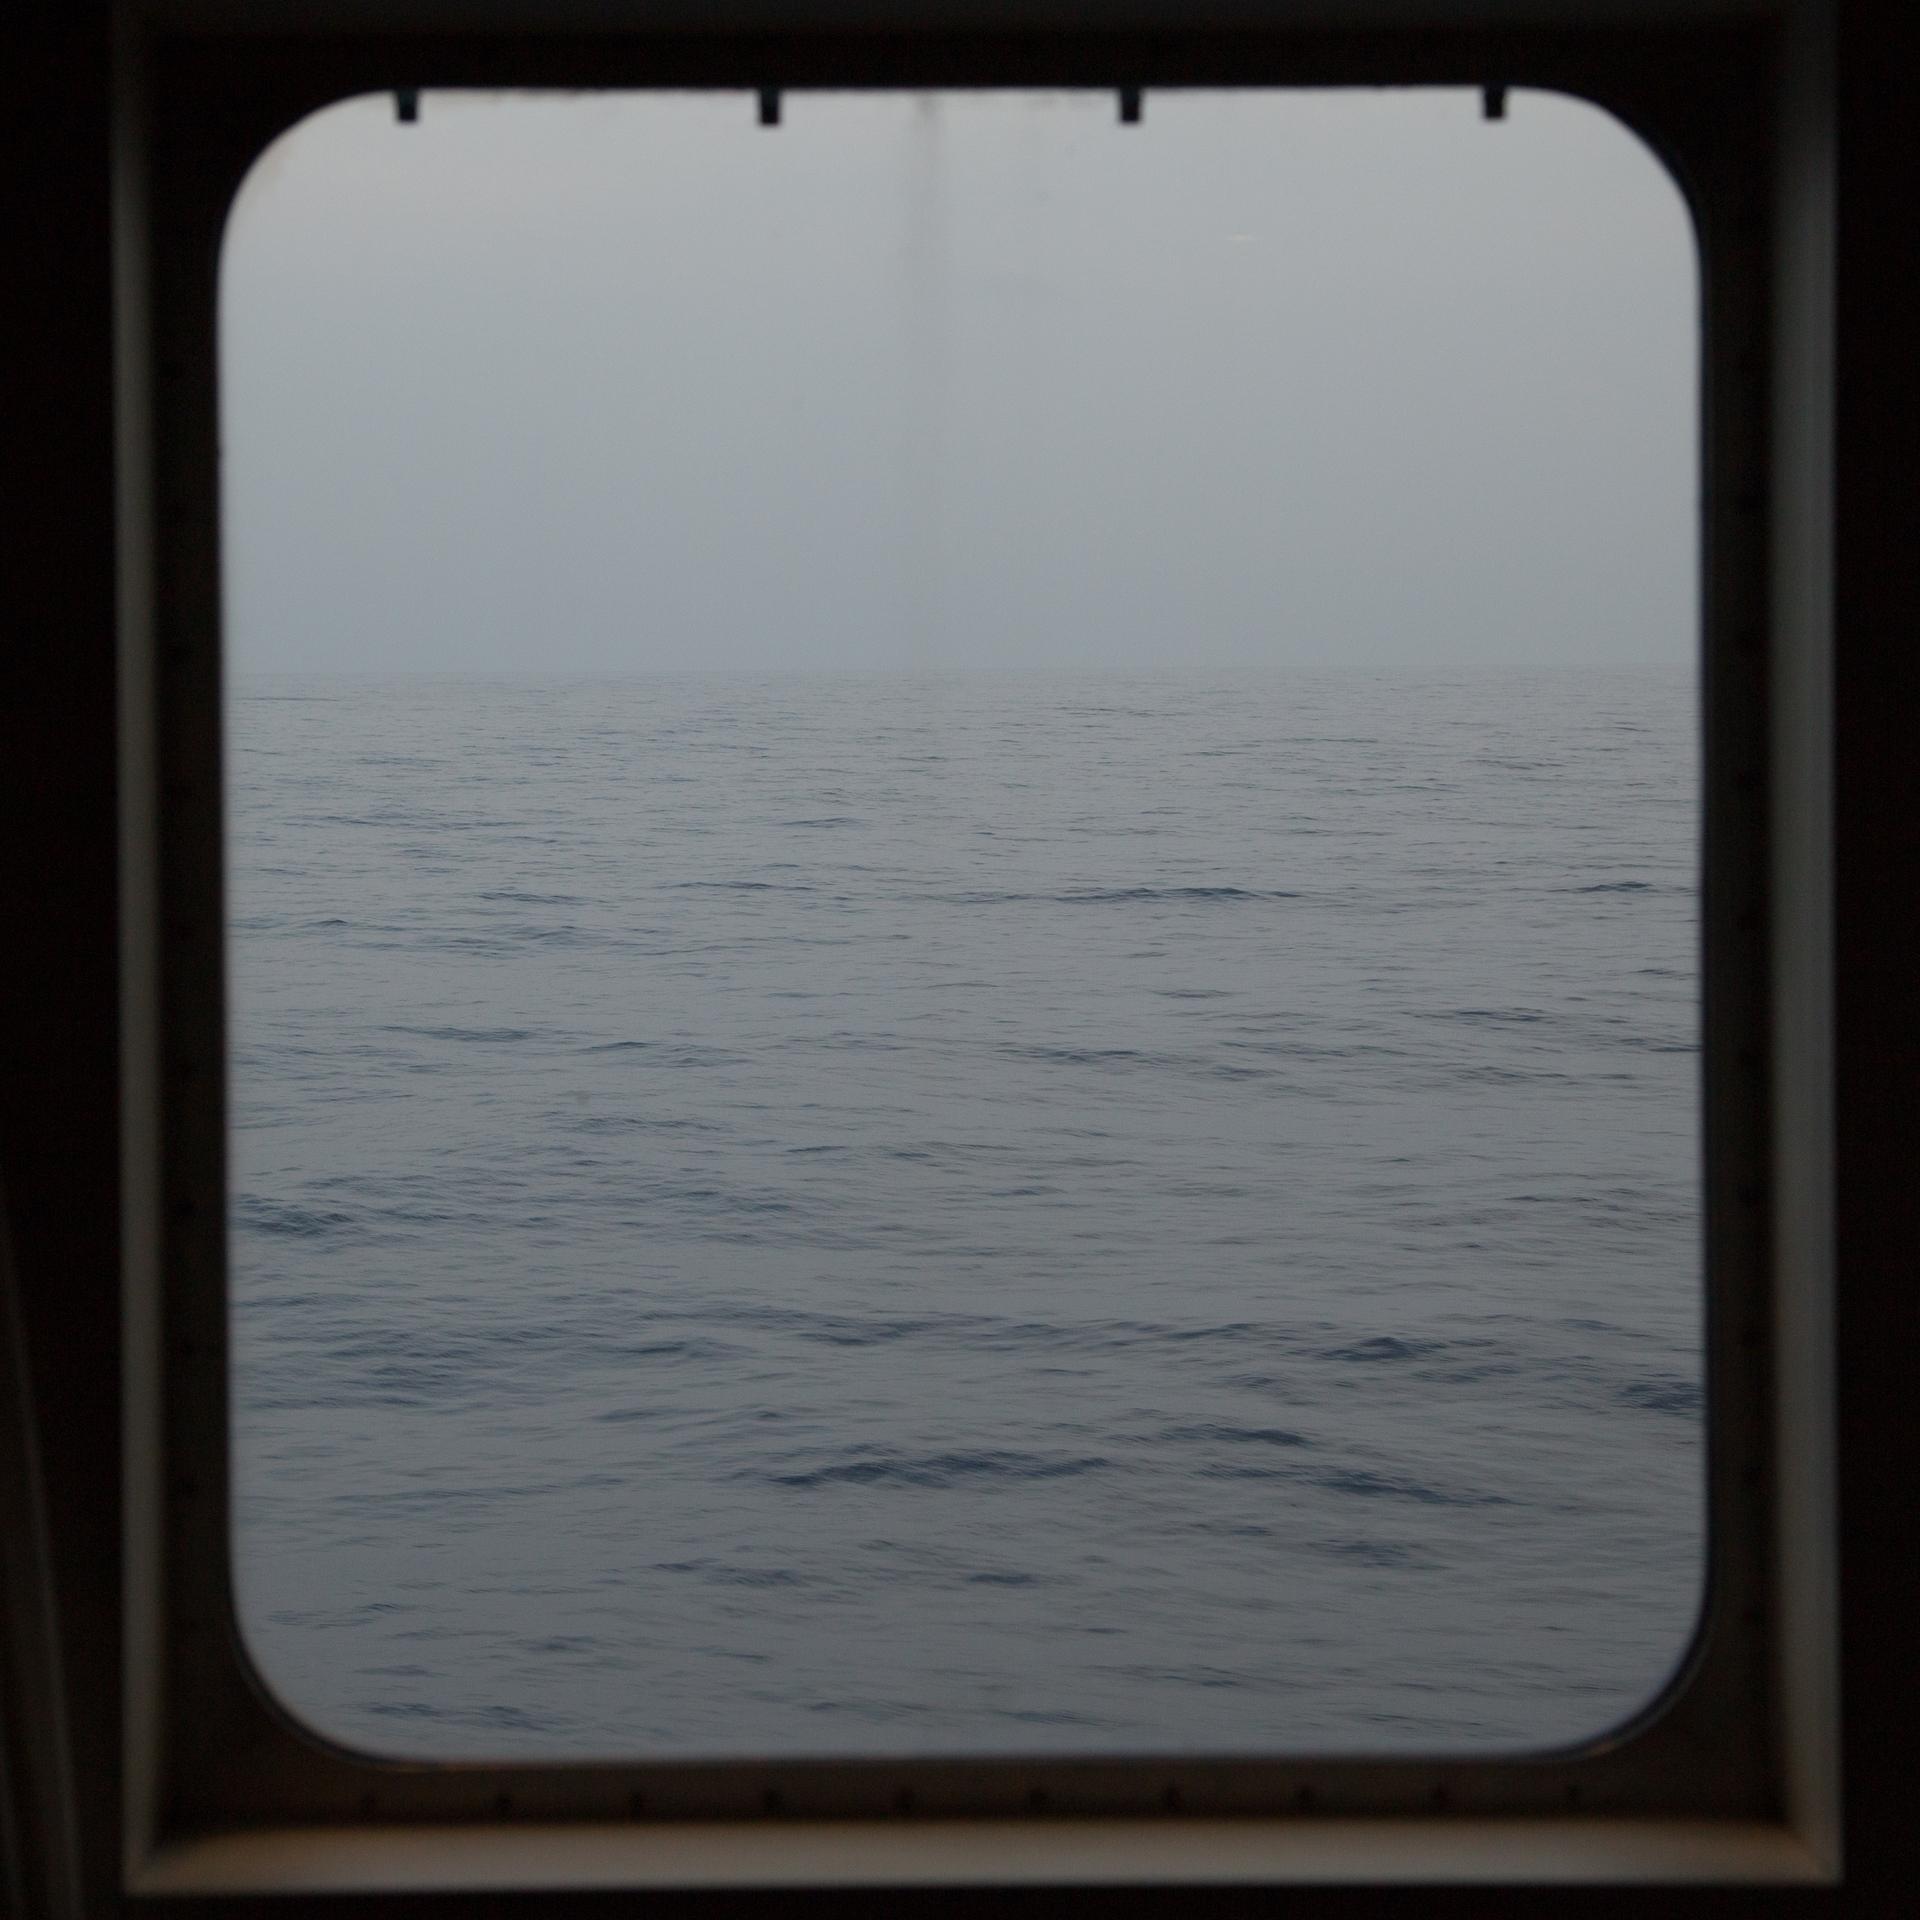 "Sight Lines: 7°44"" N, 73°12"" E"